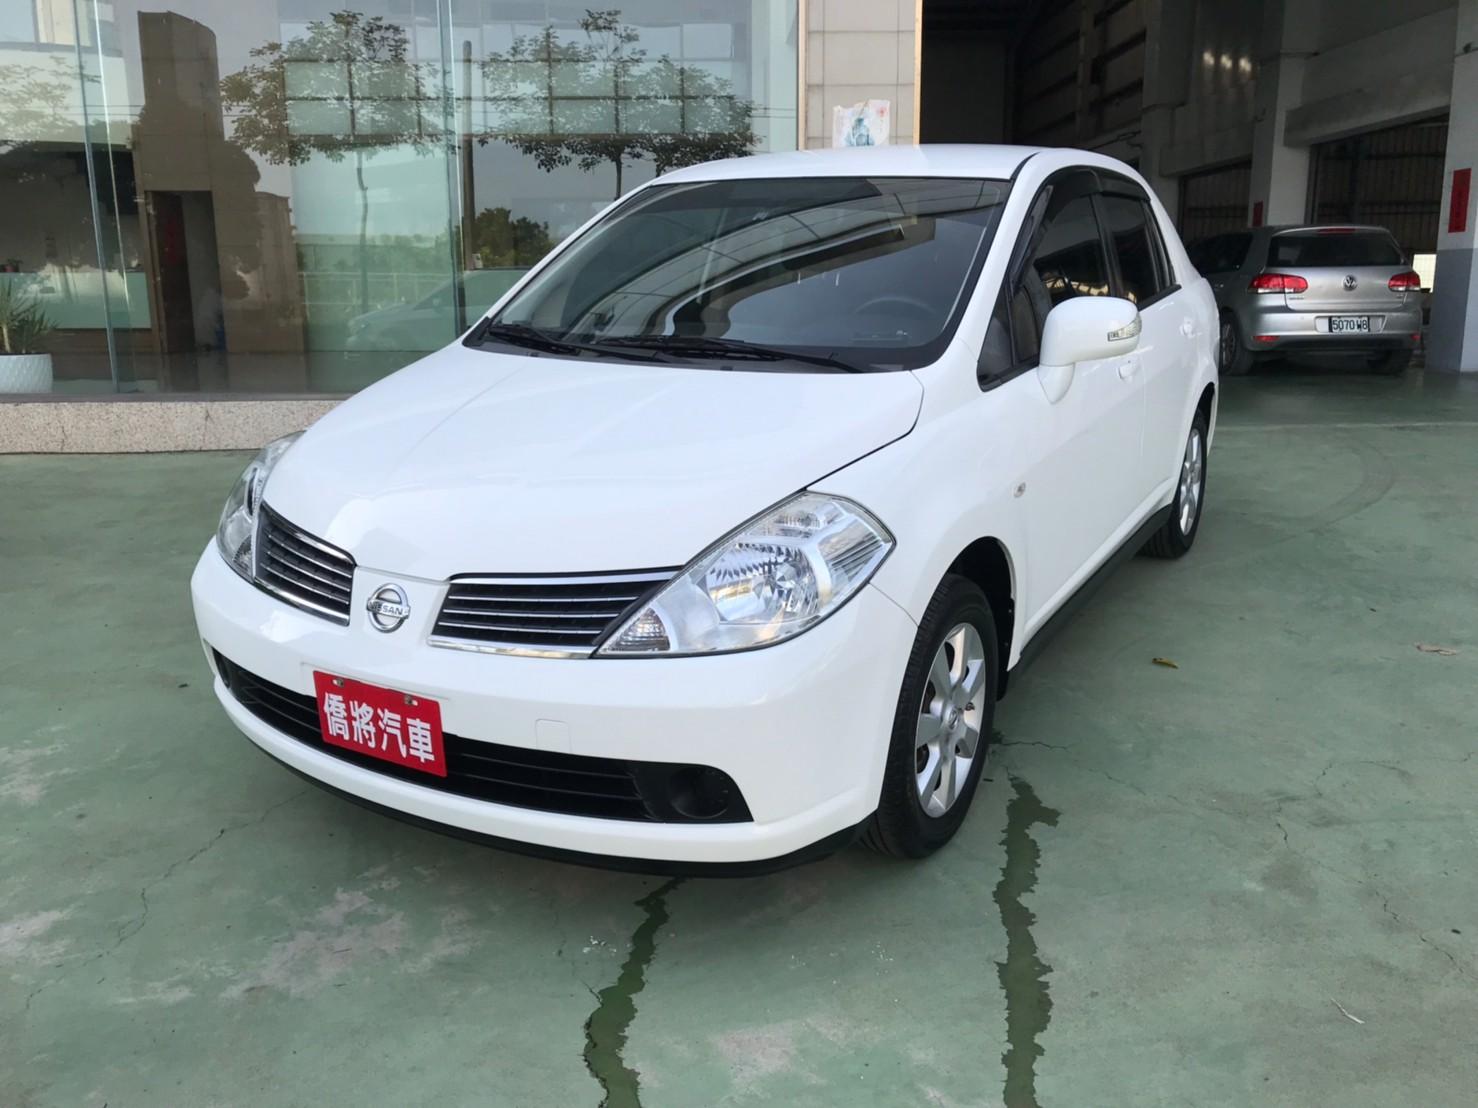 2017TIIDA 4D 里程保證 認證車 白色黑內裝 代步上課通勤好停車 SUM29.8 1.6c_210615_10